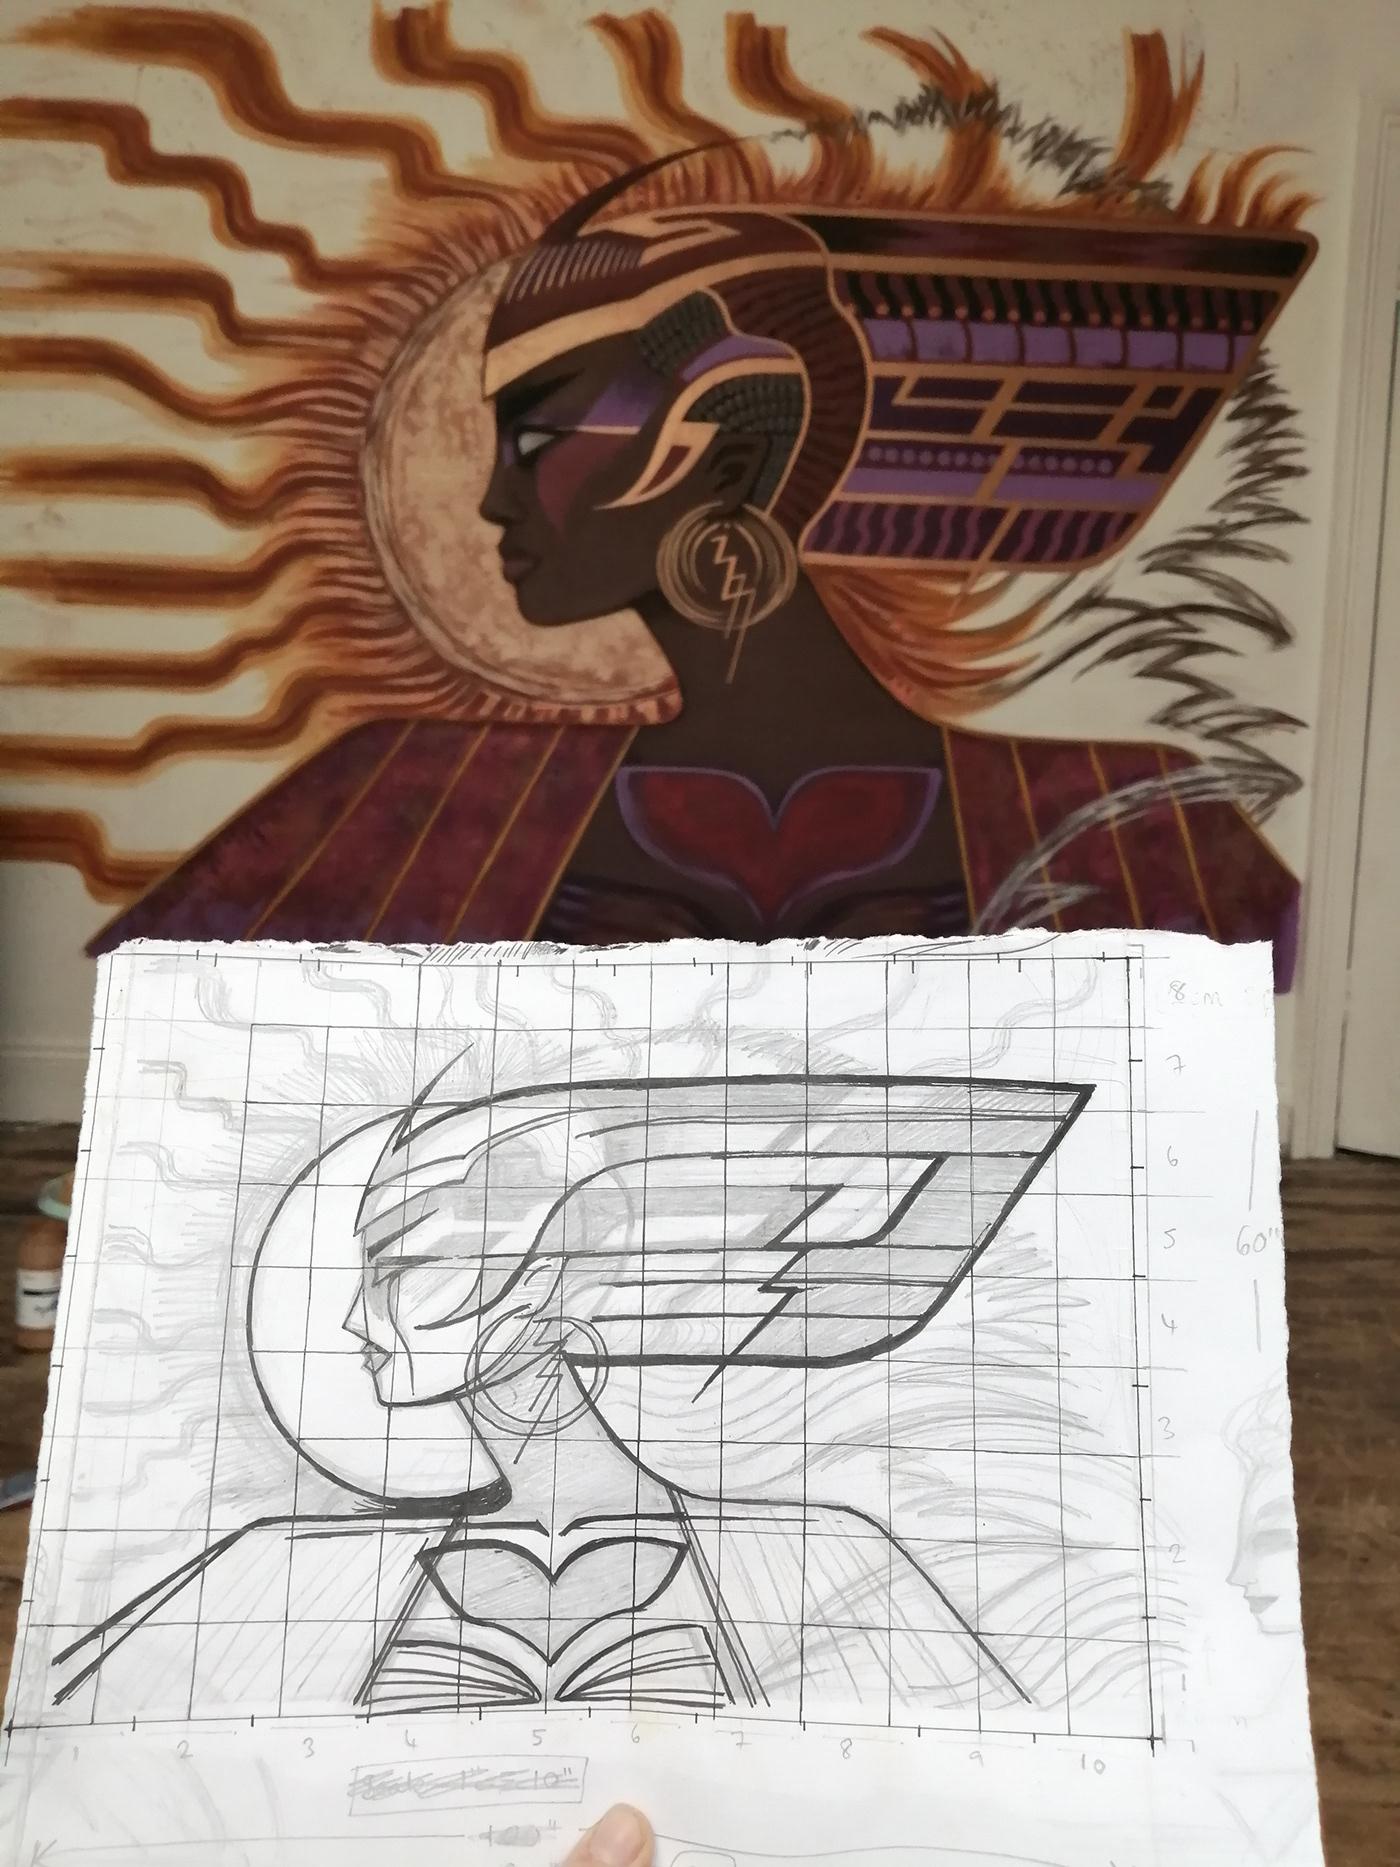 afrofuturism deity empowered female goddess Nature power storms woman women